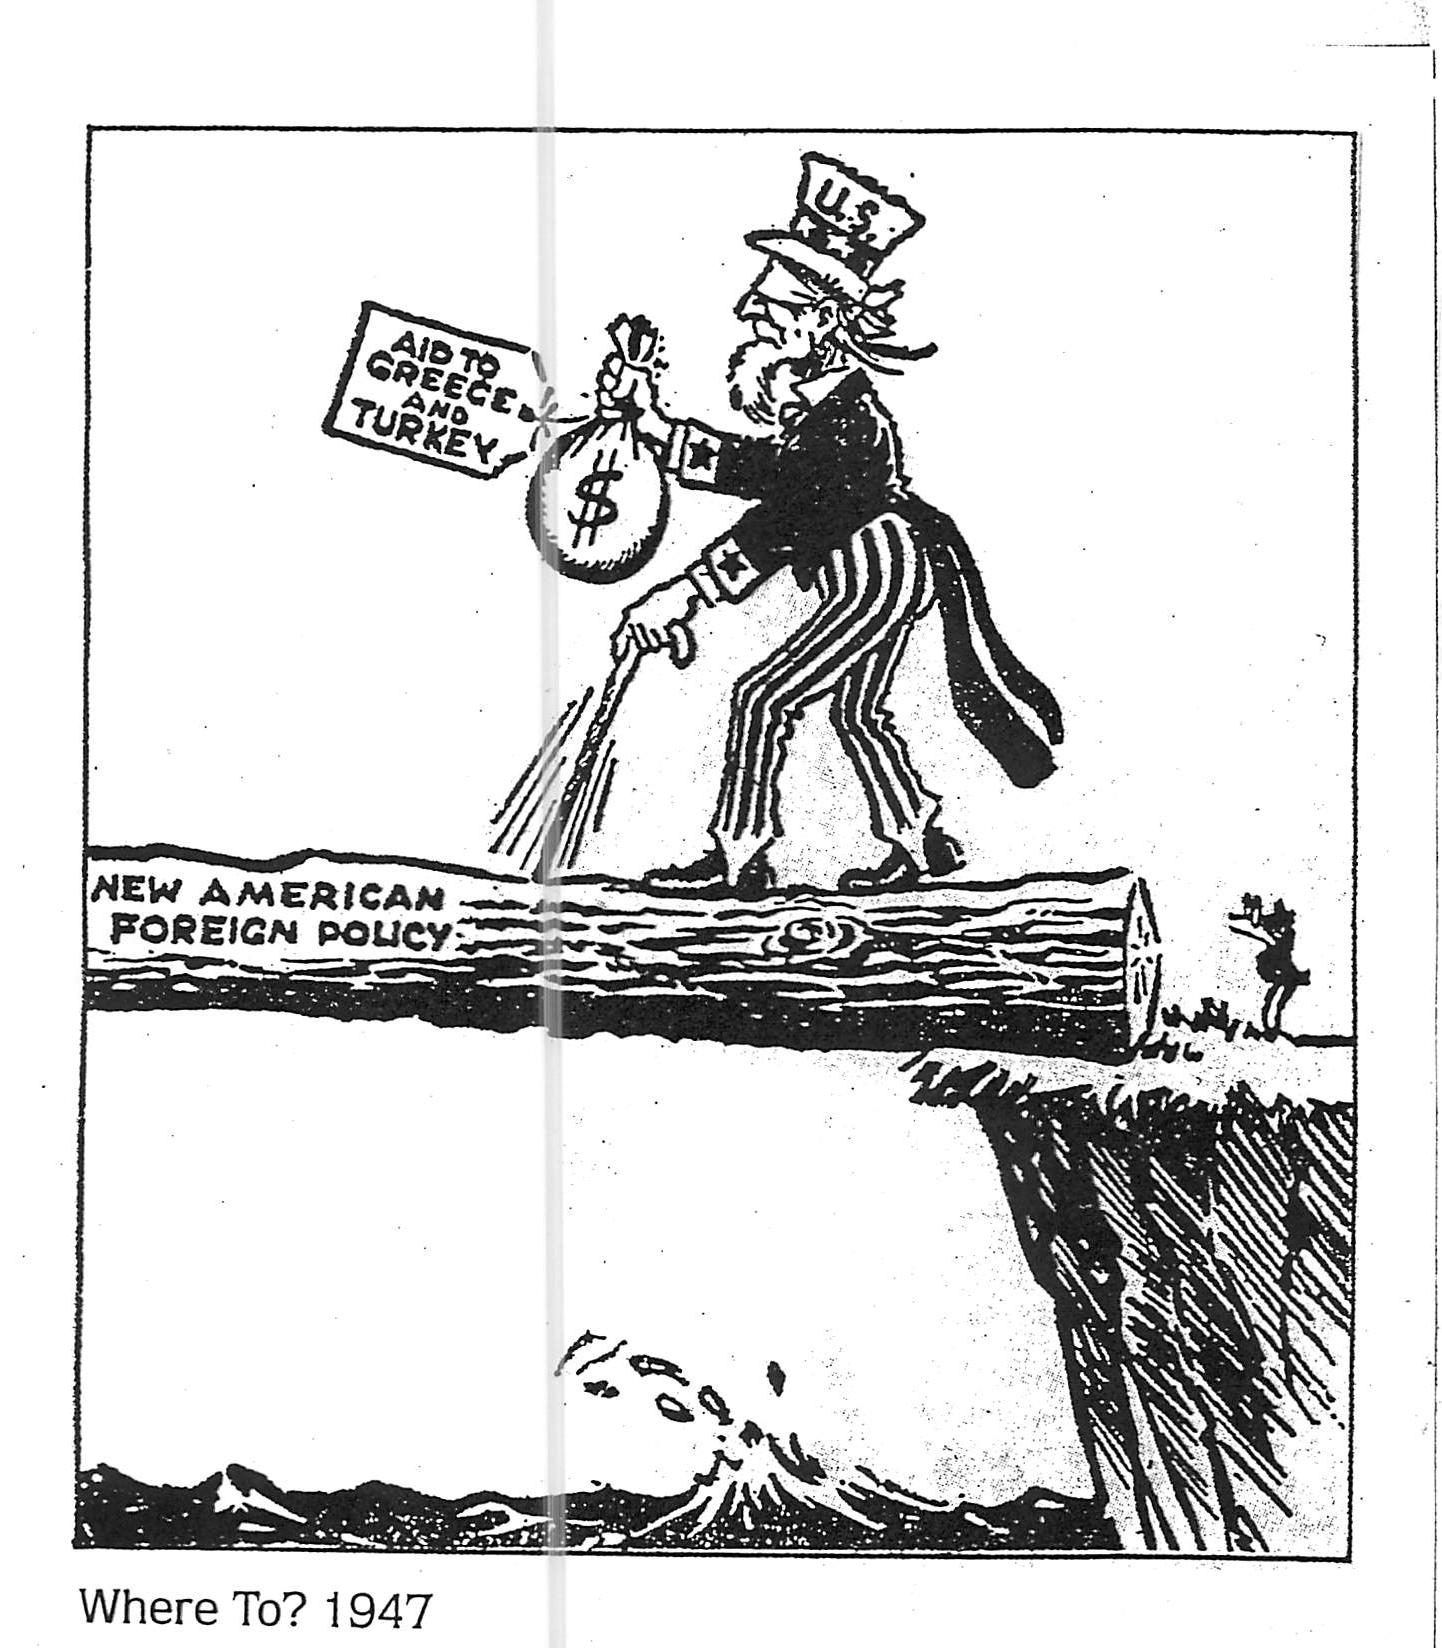 Political Cartoons Truman Doctrine Amp Marshall Plan